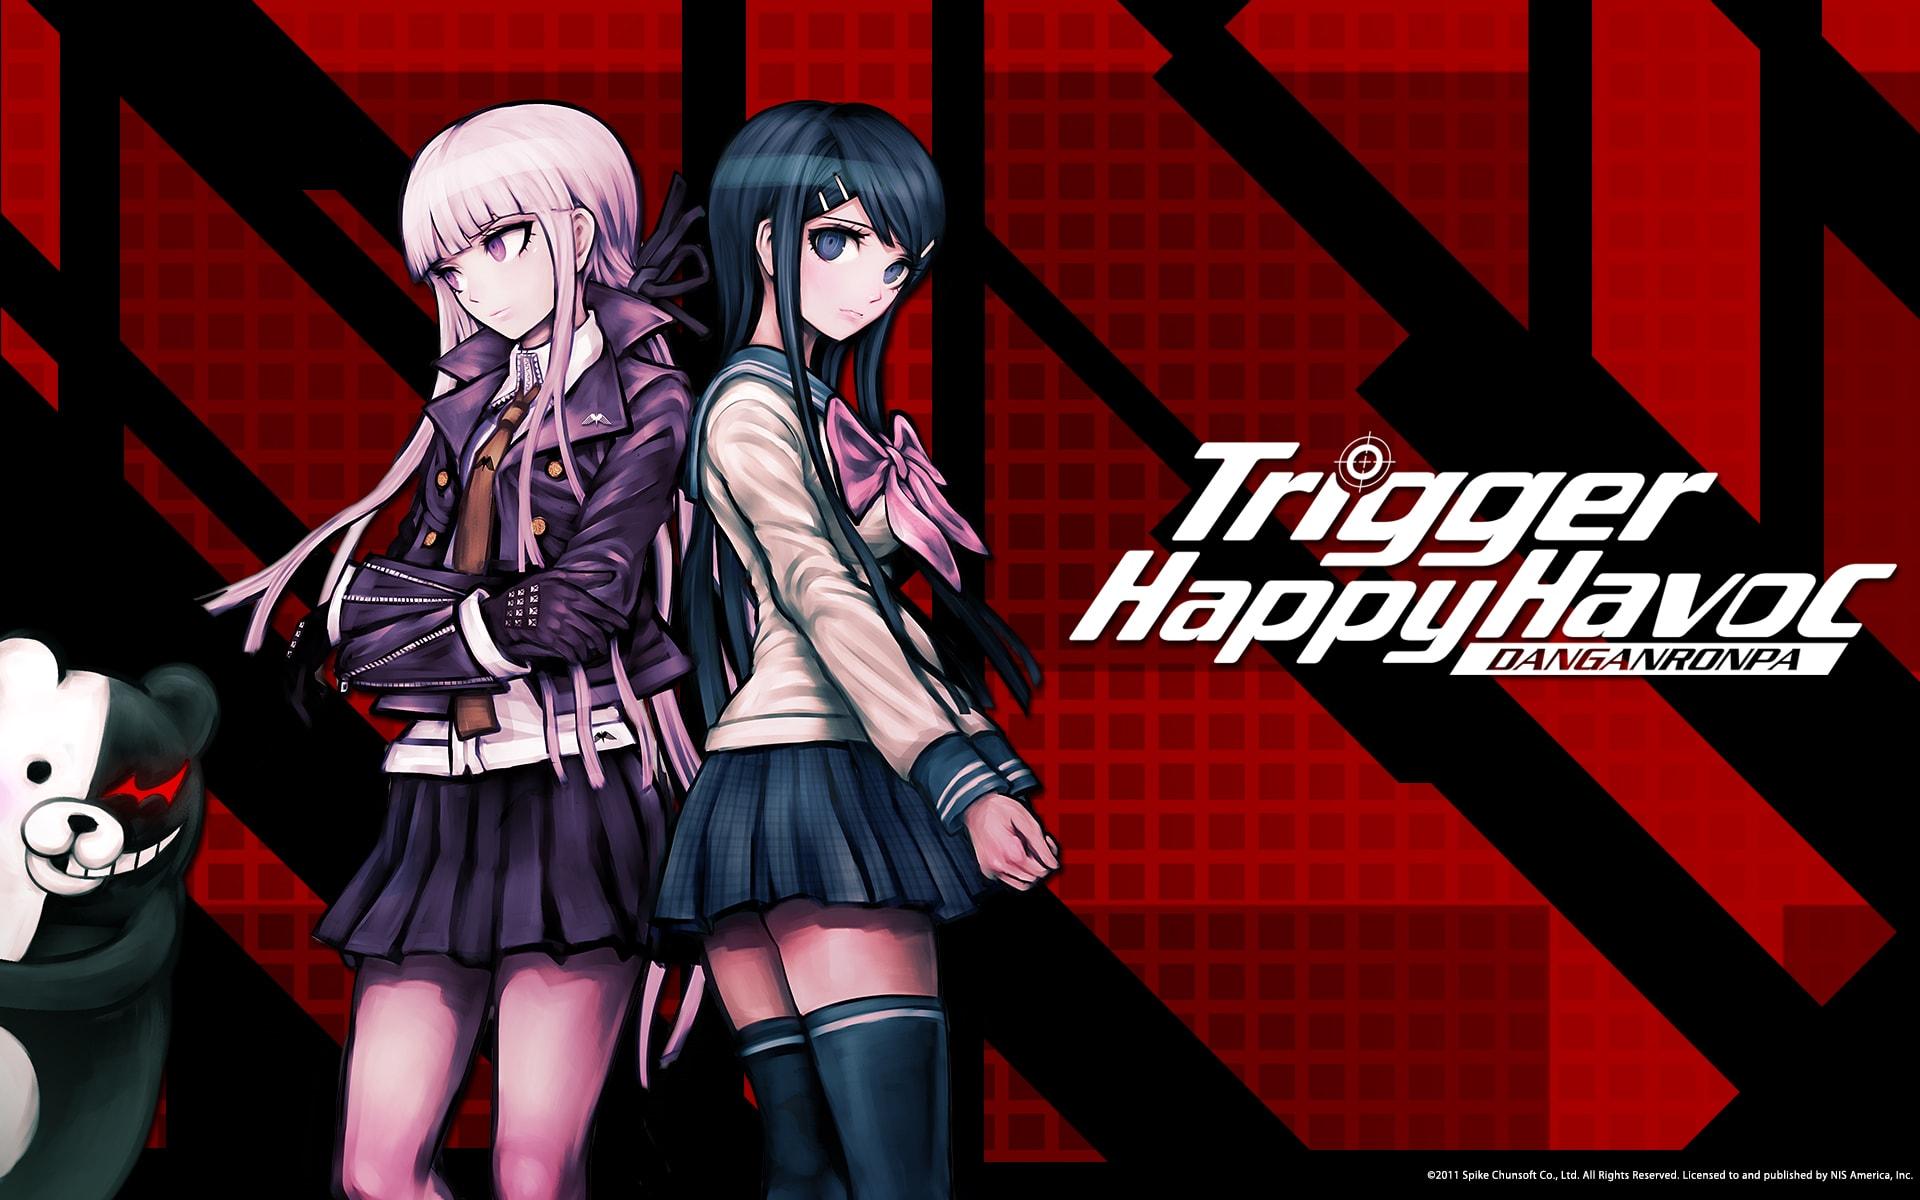 Danganronpa: Trigger Happy Havoc widescreen wallpapers